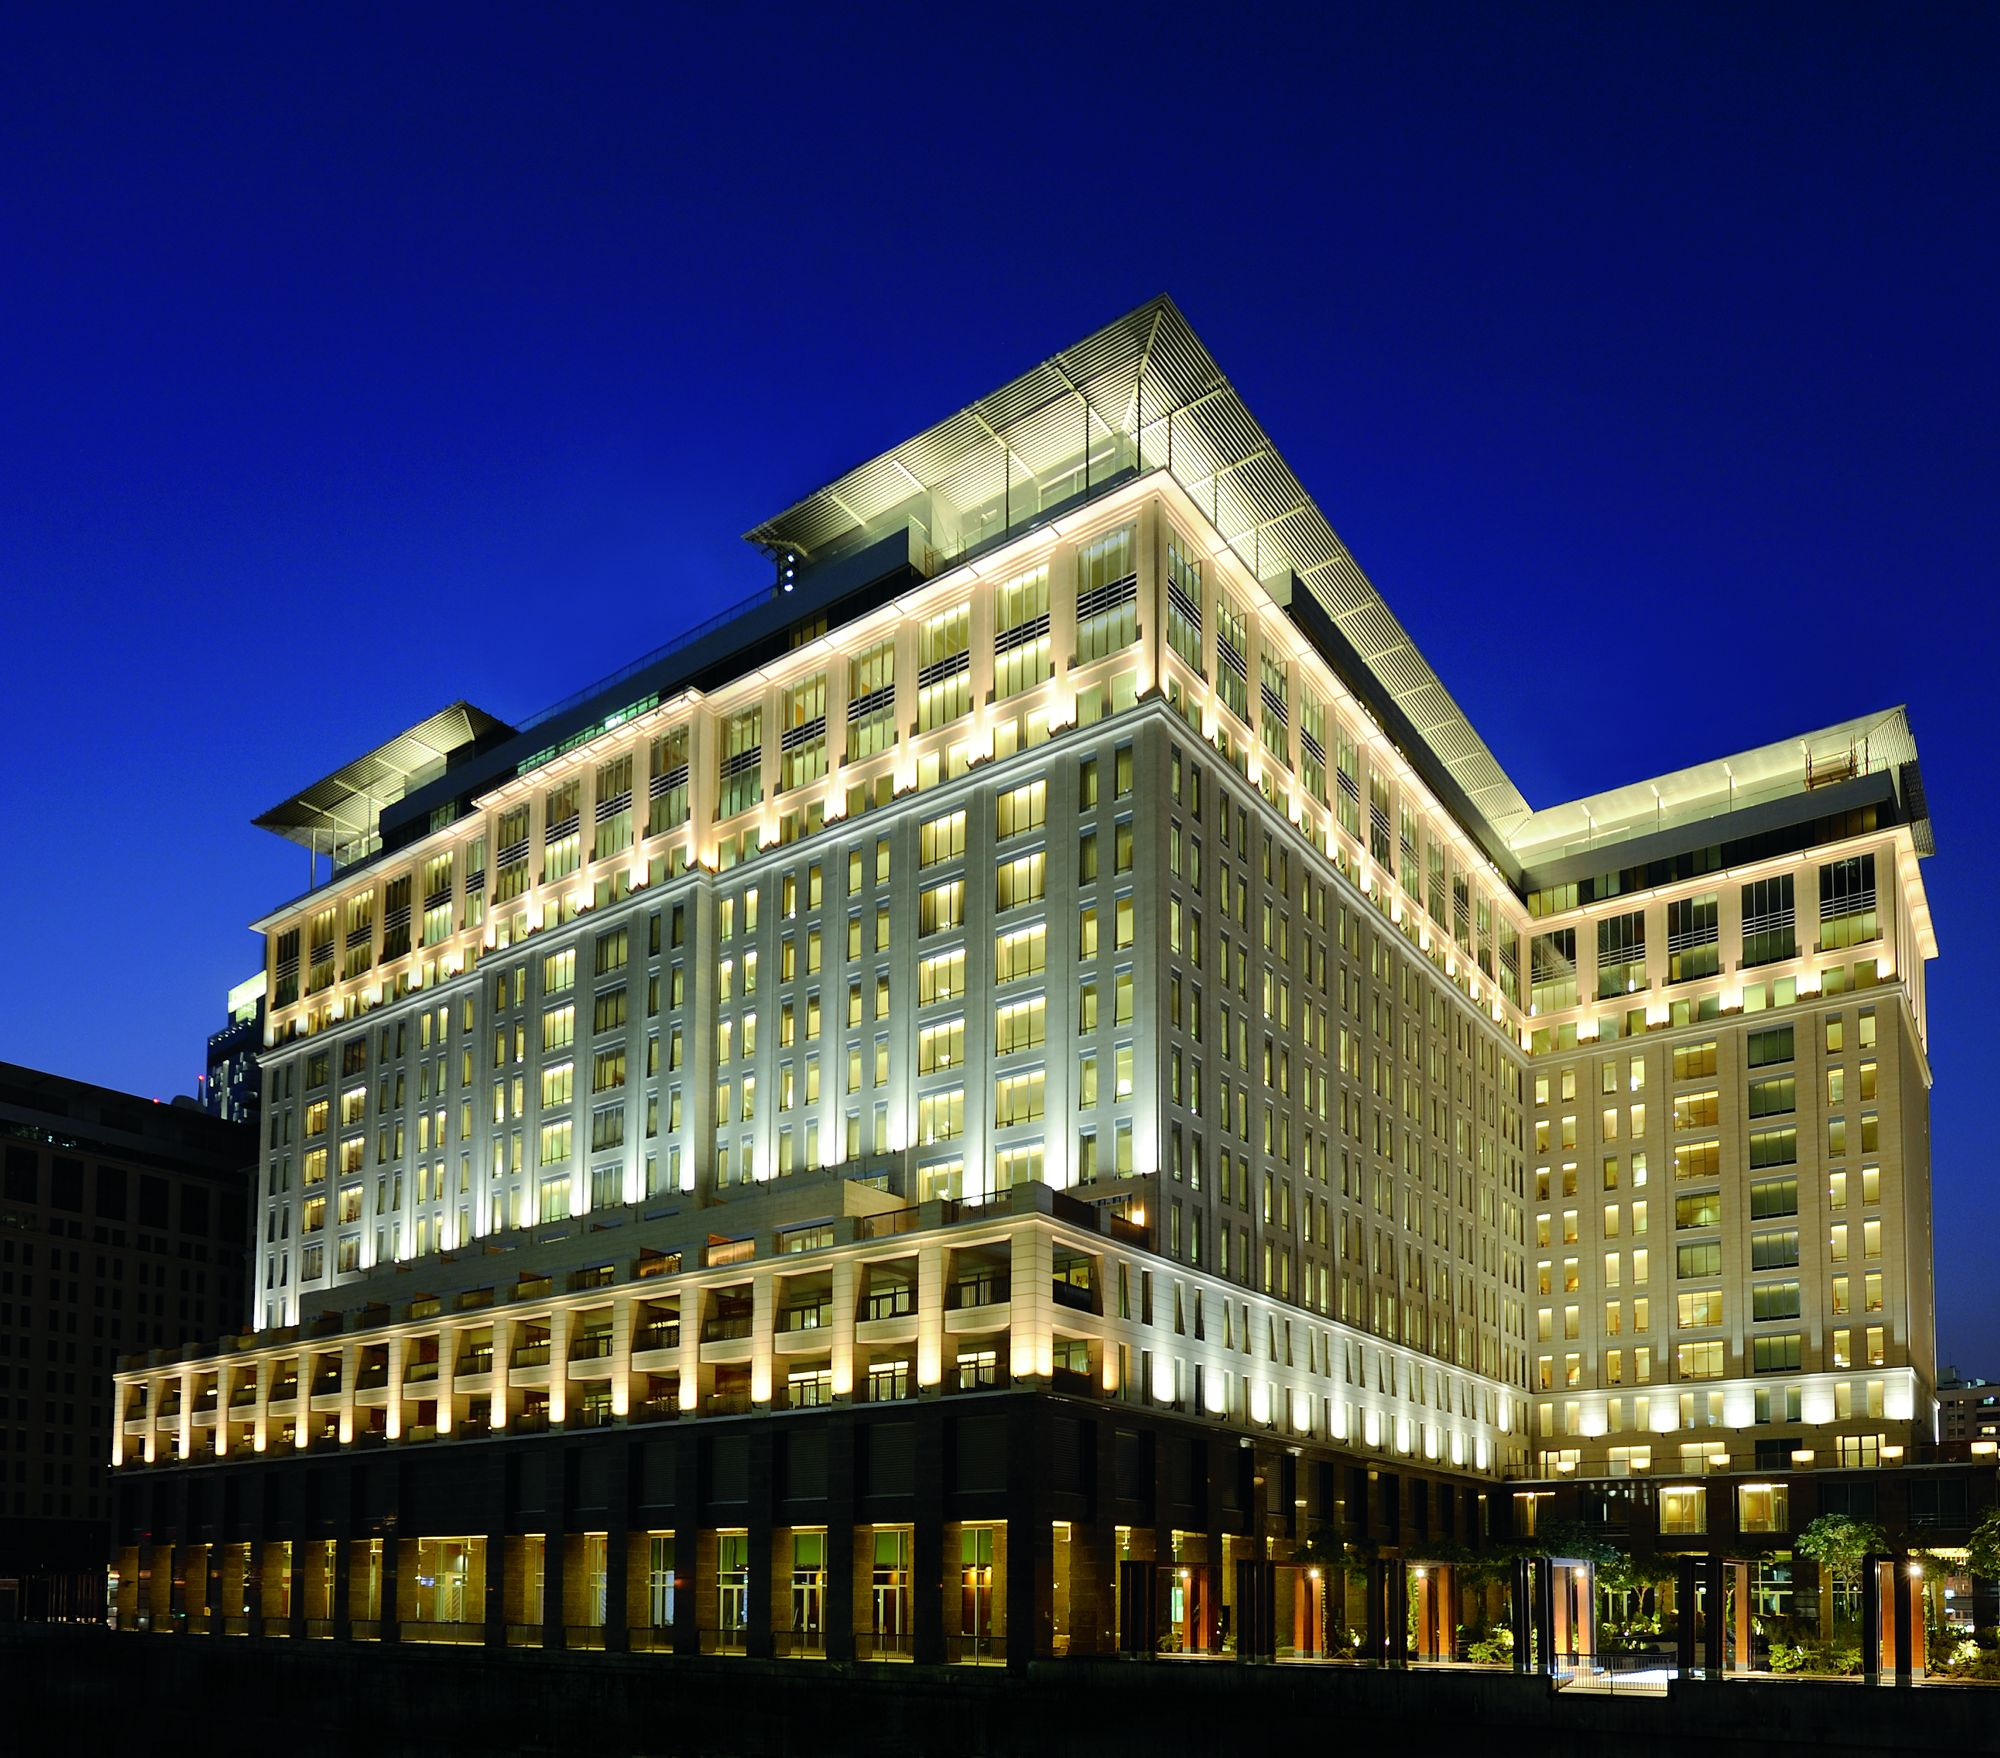 Luxury Hotels Sheikh Zayed Road | The Ritz-Carlton, Dubai